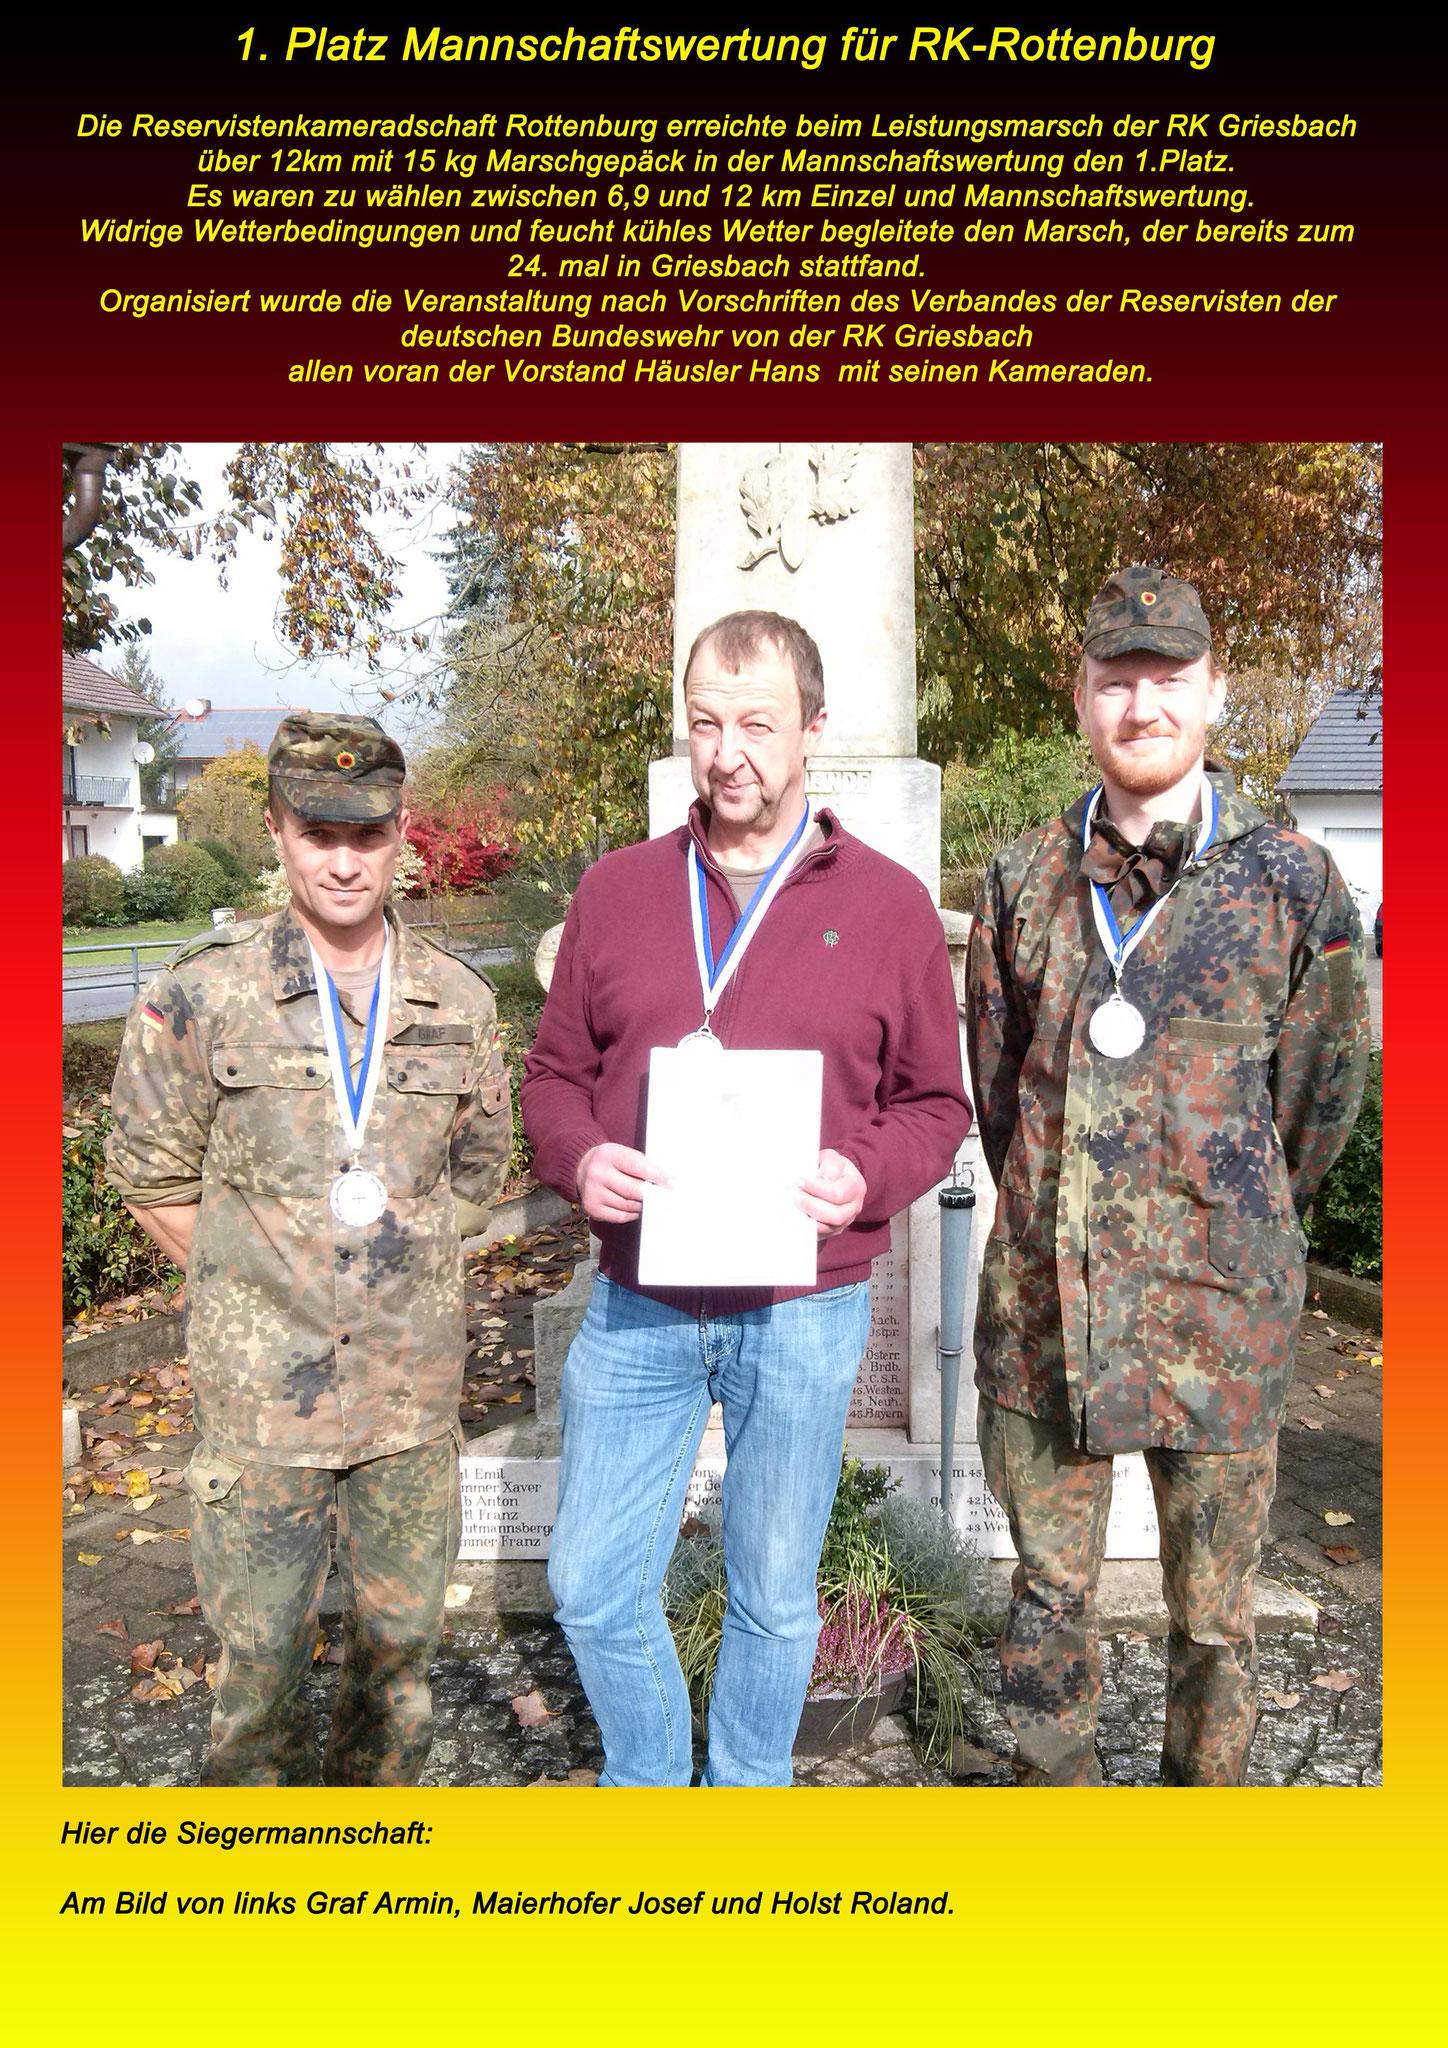 Leistungsmarsch am 29.10.16 in Griesbach